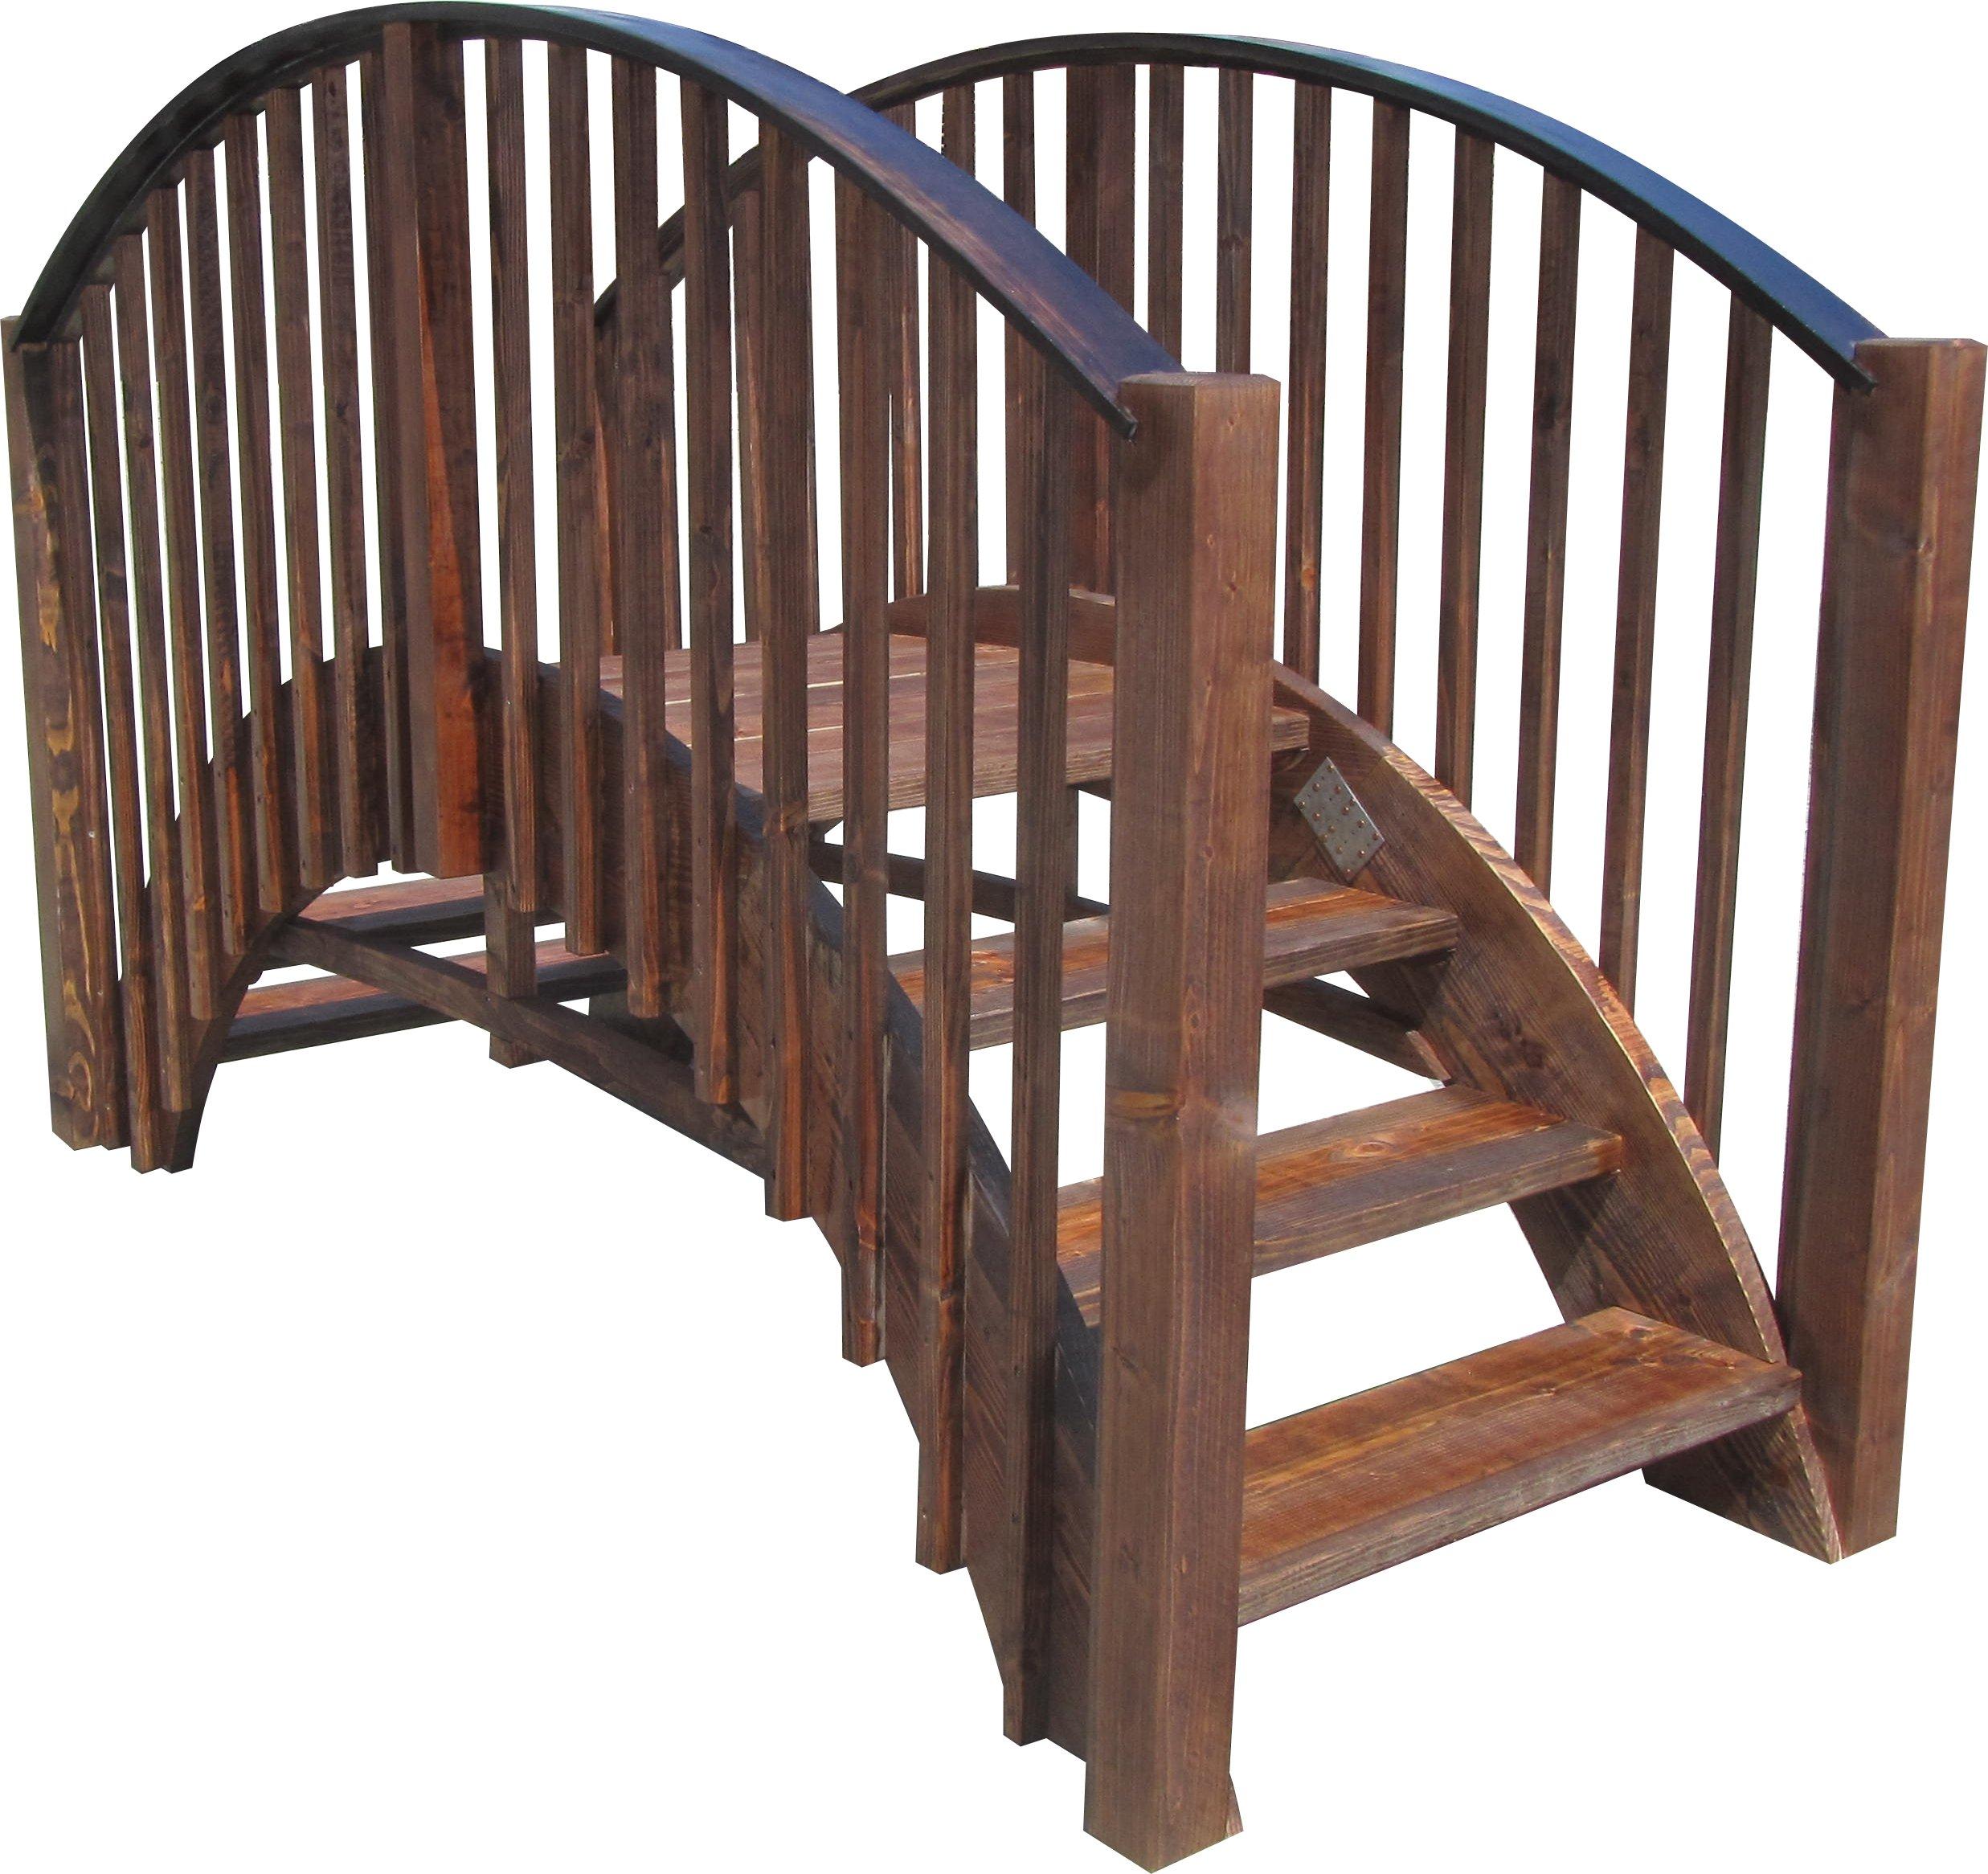 SamsGazebos 8' Japanese Wood Garden Bridge, Treated